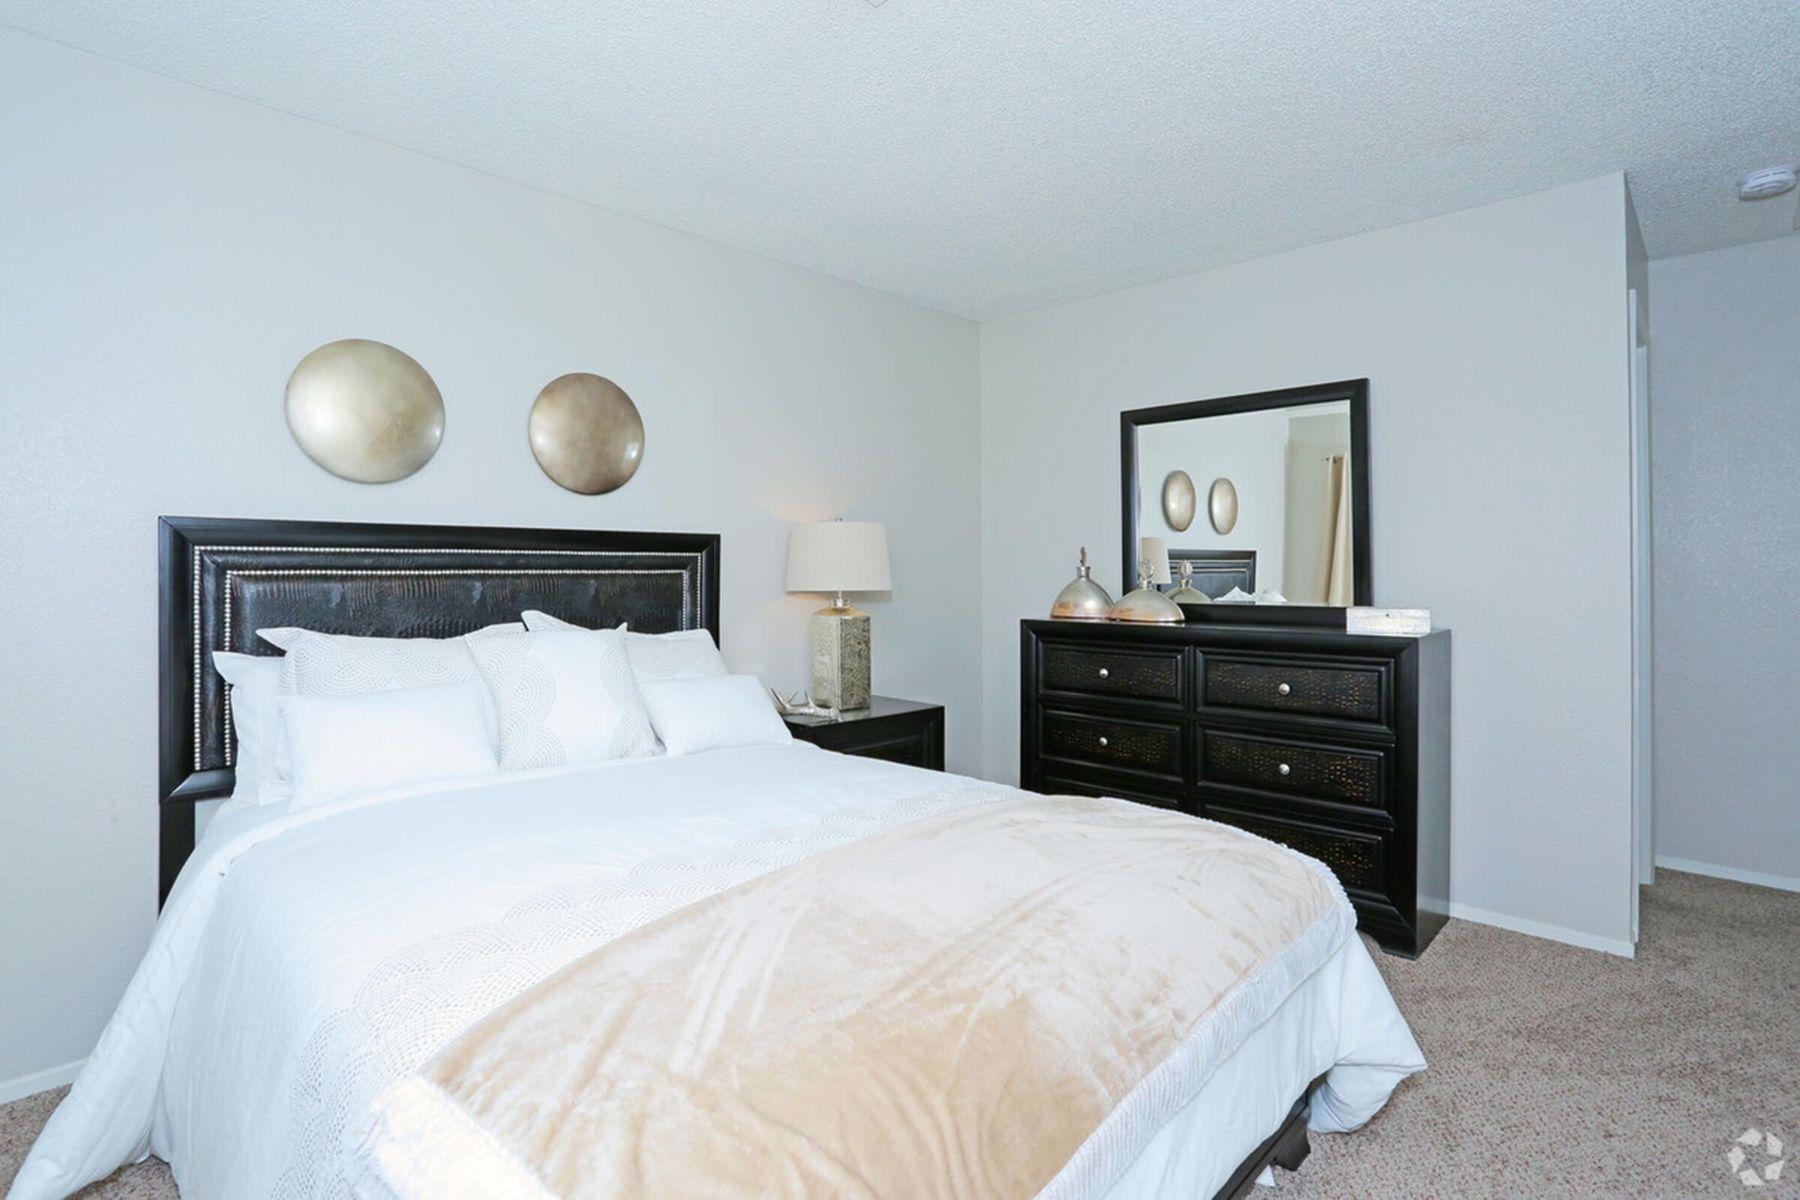 sunset-hills-apartments-henderson-nv-2br-2ba---960-sf-master-bedroom (1).jpg